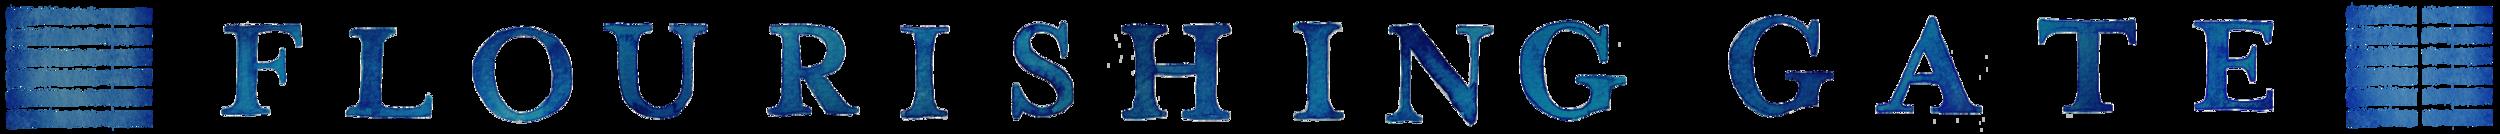 fg-logo2.png